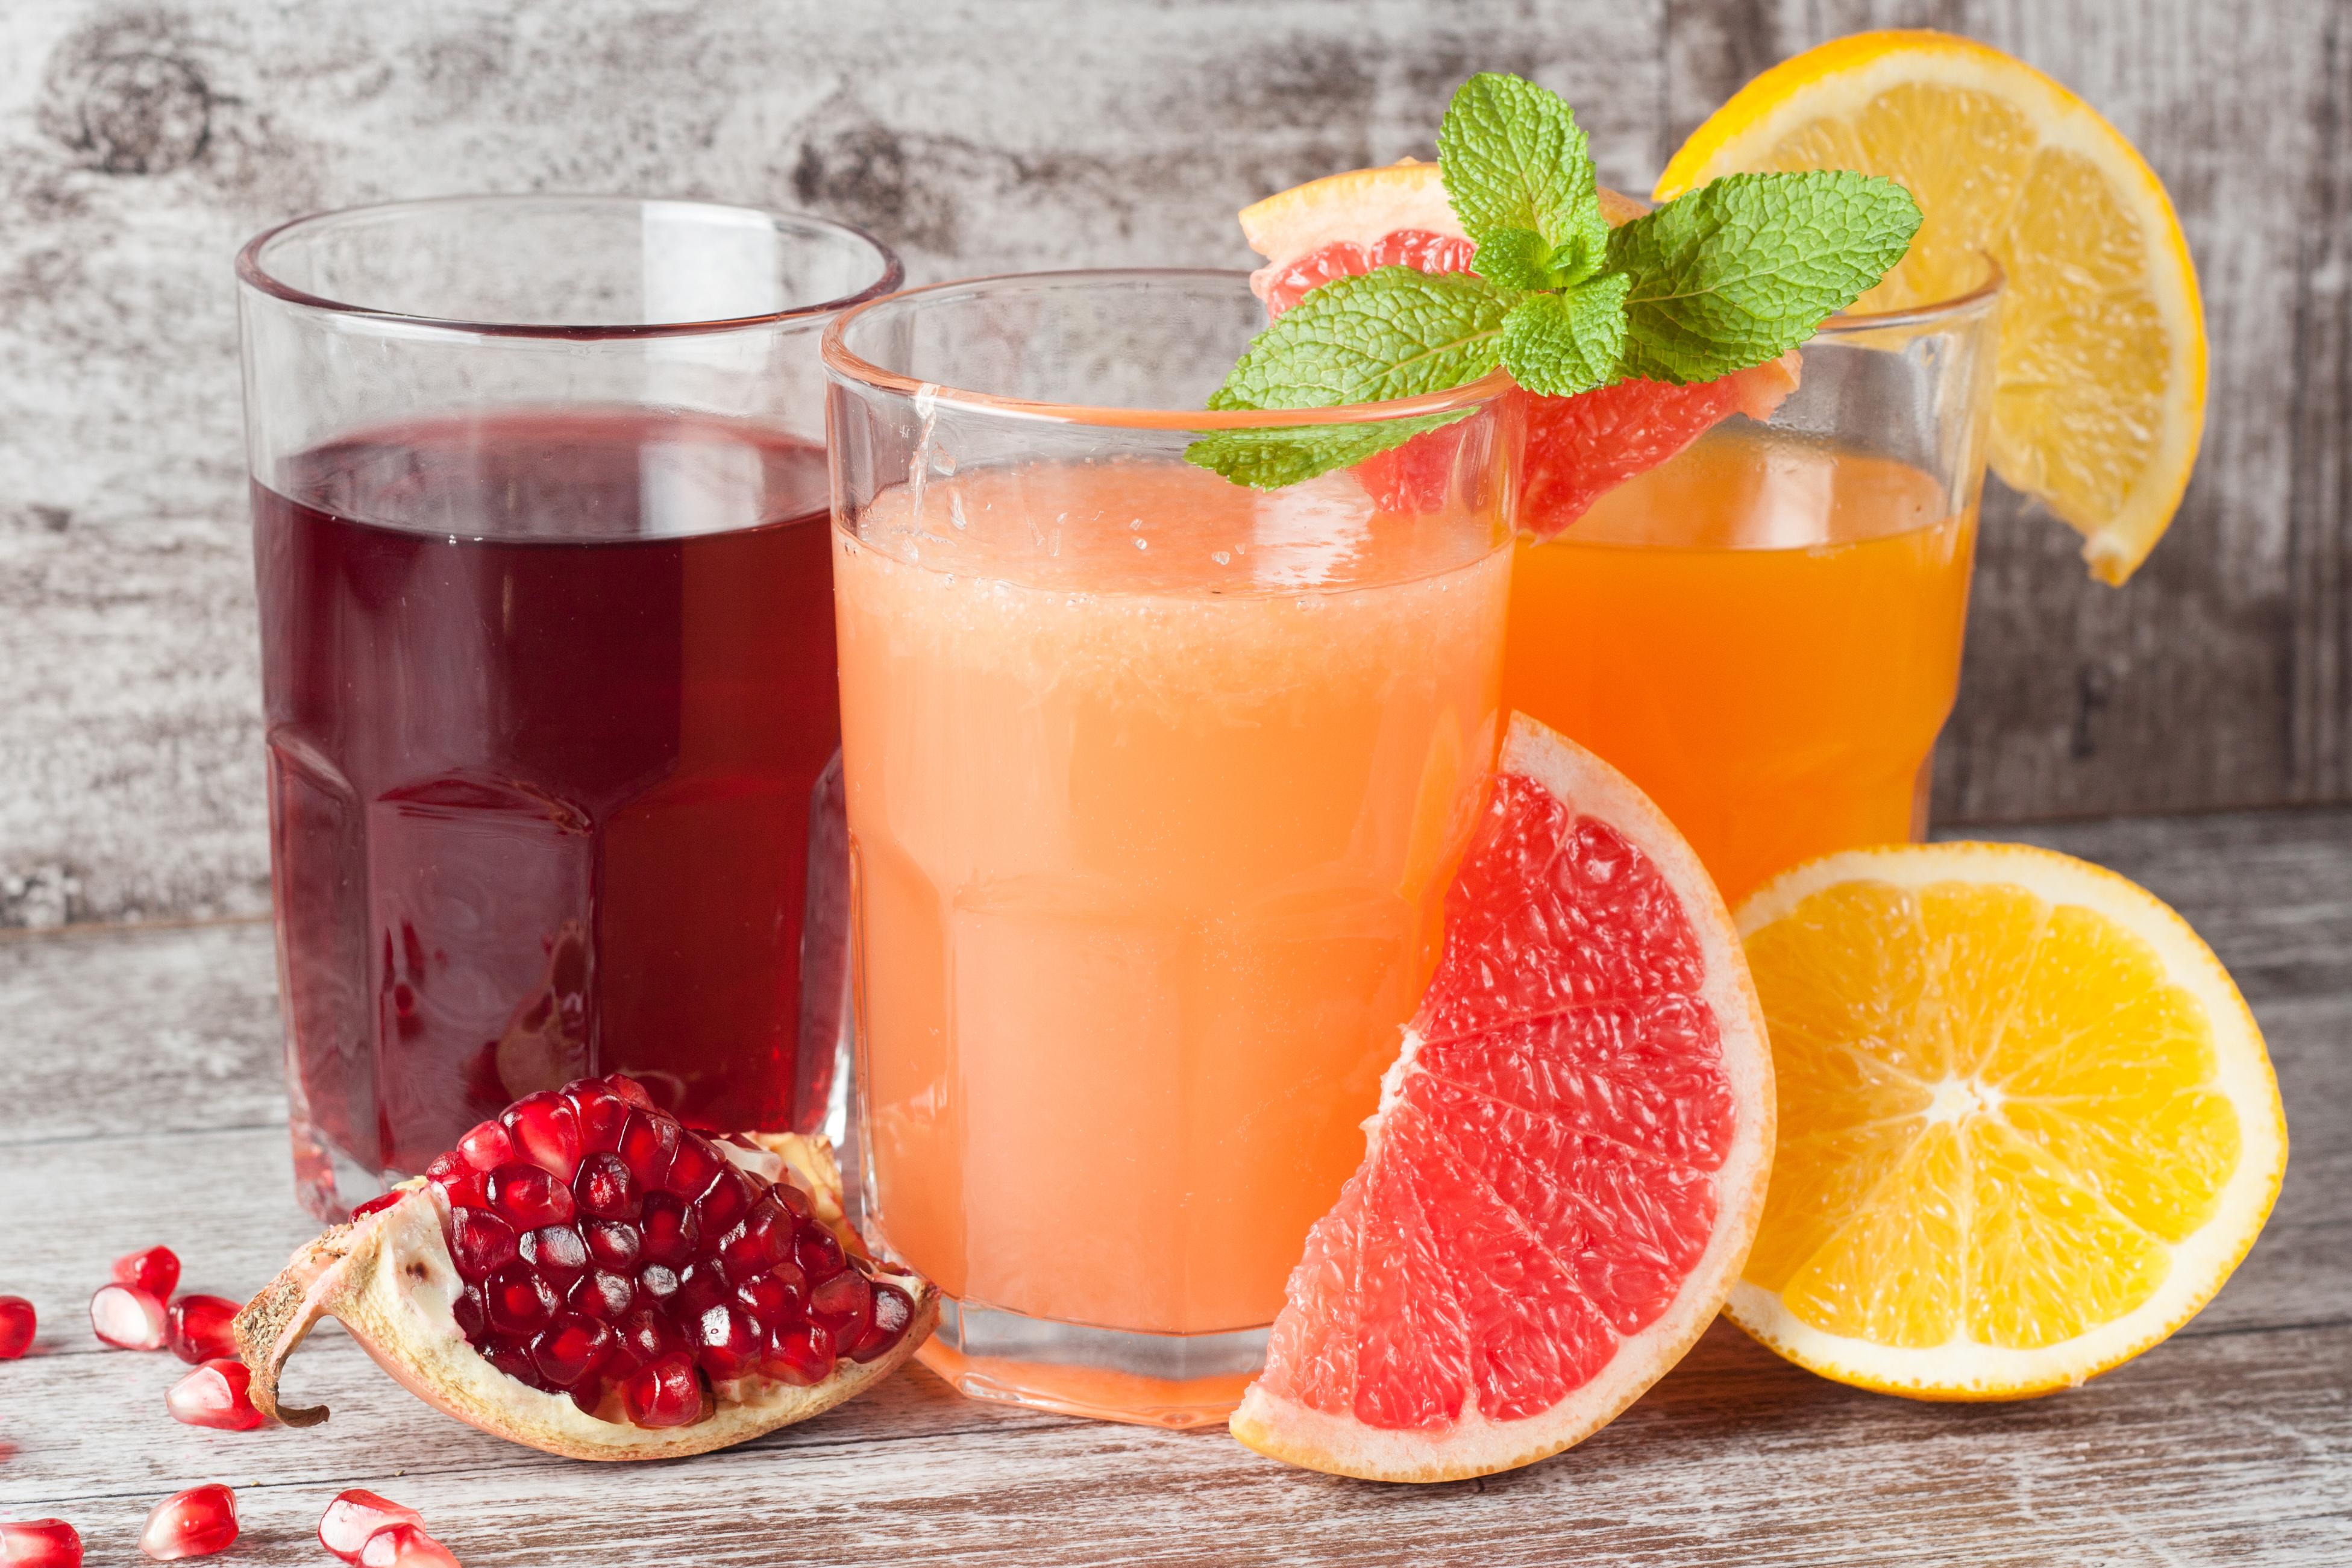 Glasses of pomegranate, grapefruit, oran